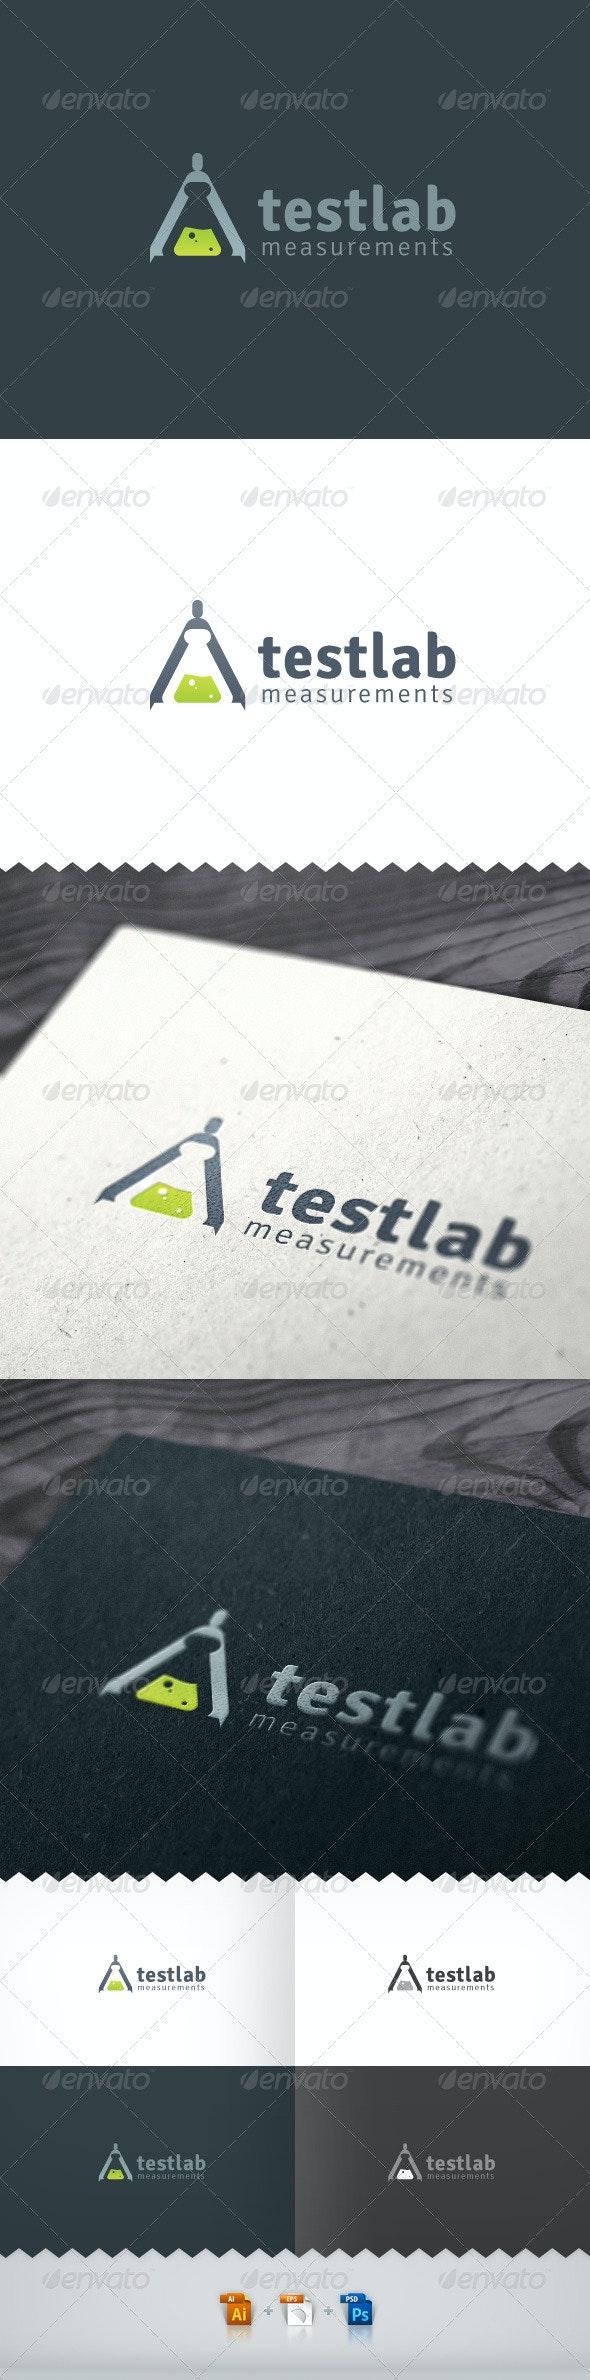 Test Lab Measurements Logo - Objects Logo Templates